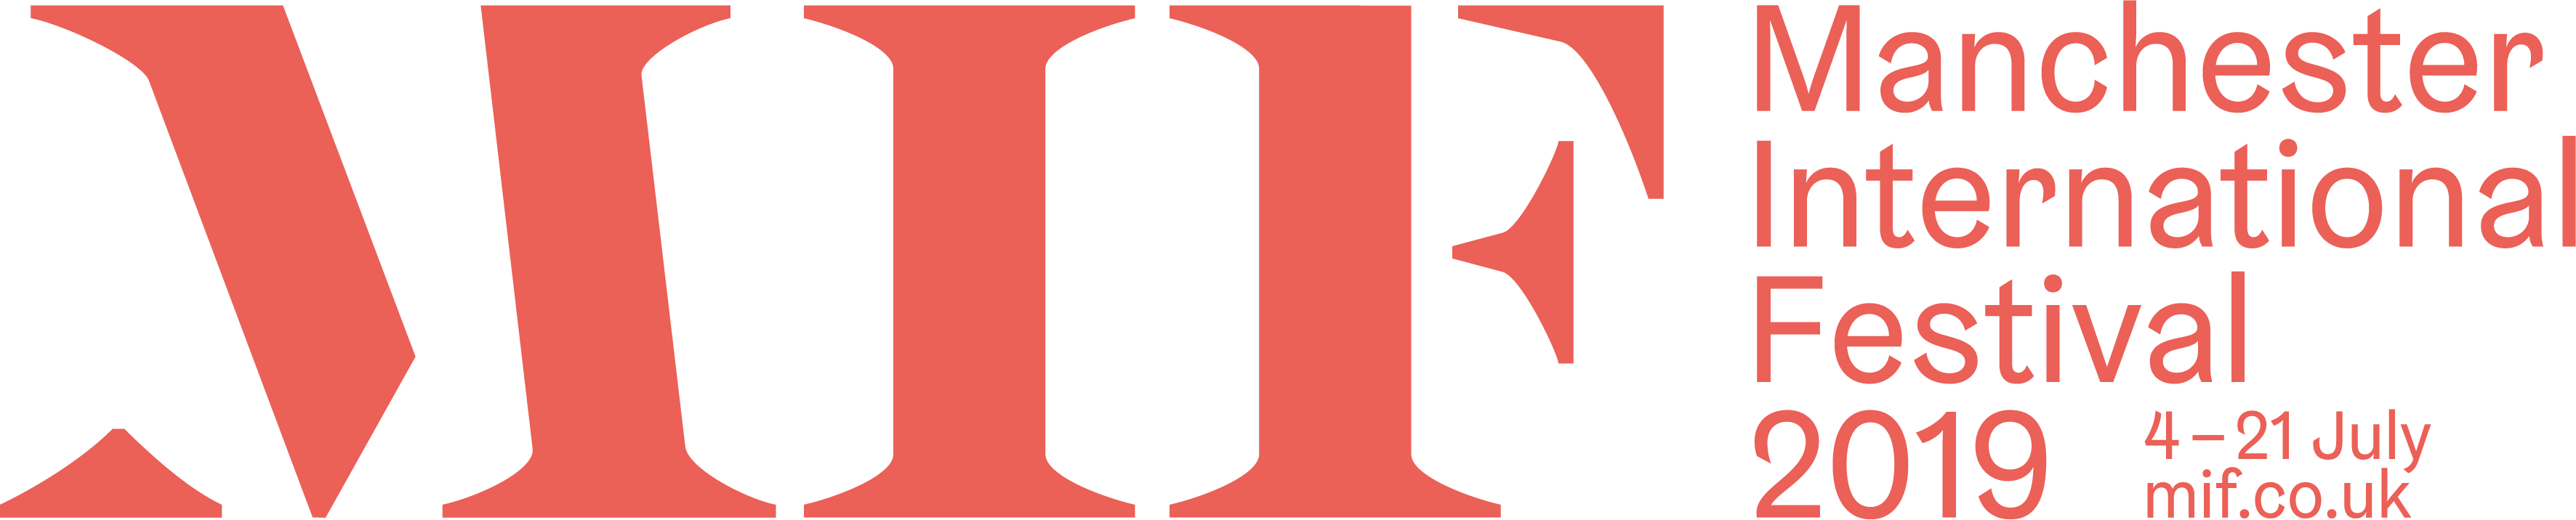 Manchester International Festival 2019 Logo (Property of MIF2019)